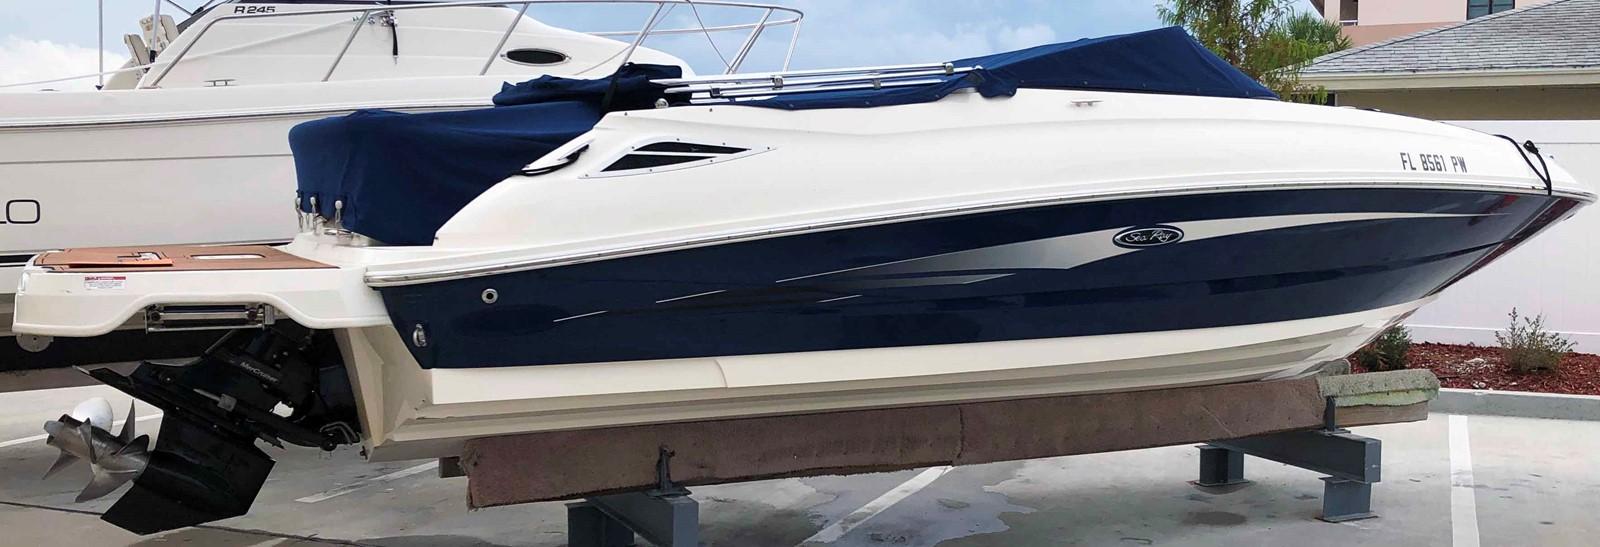 2015 SEA RAY 240 SunDeck Deck Boat 2674214